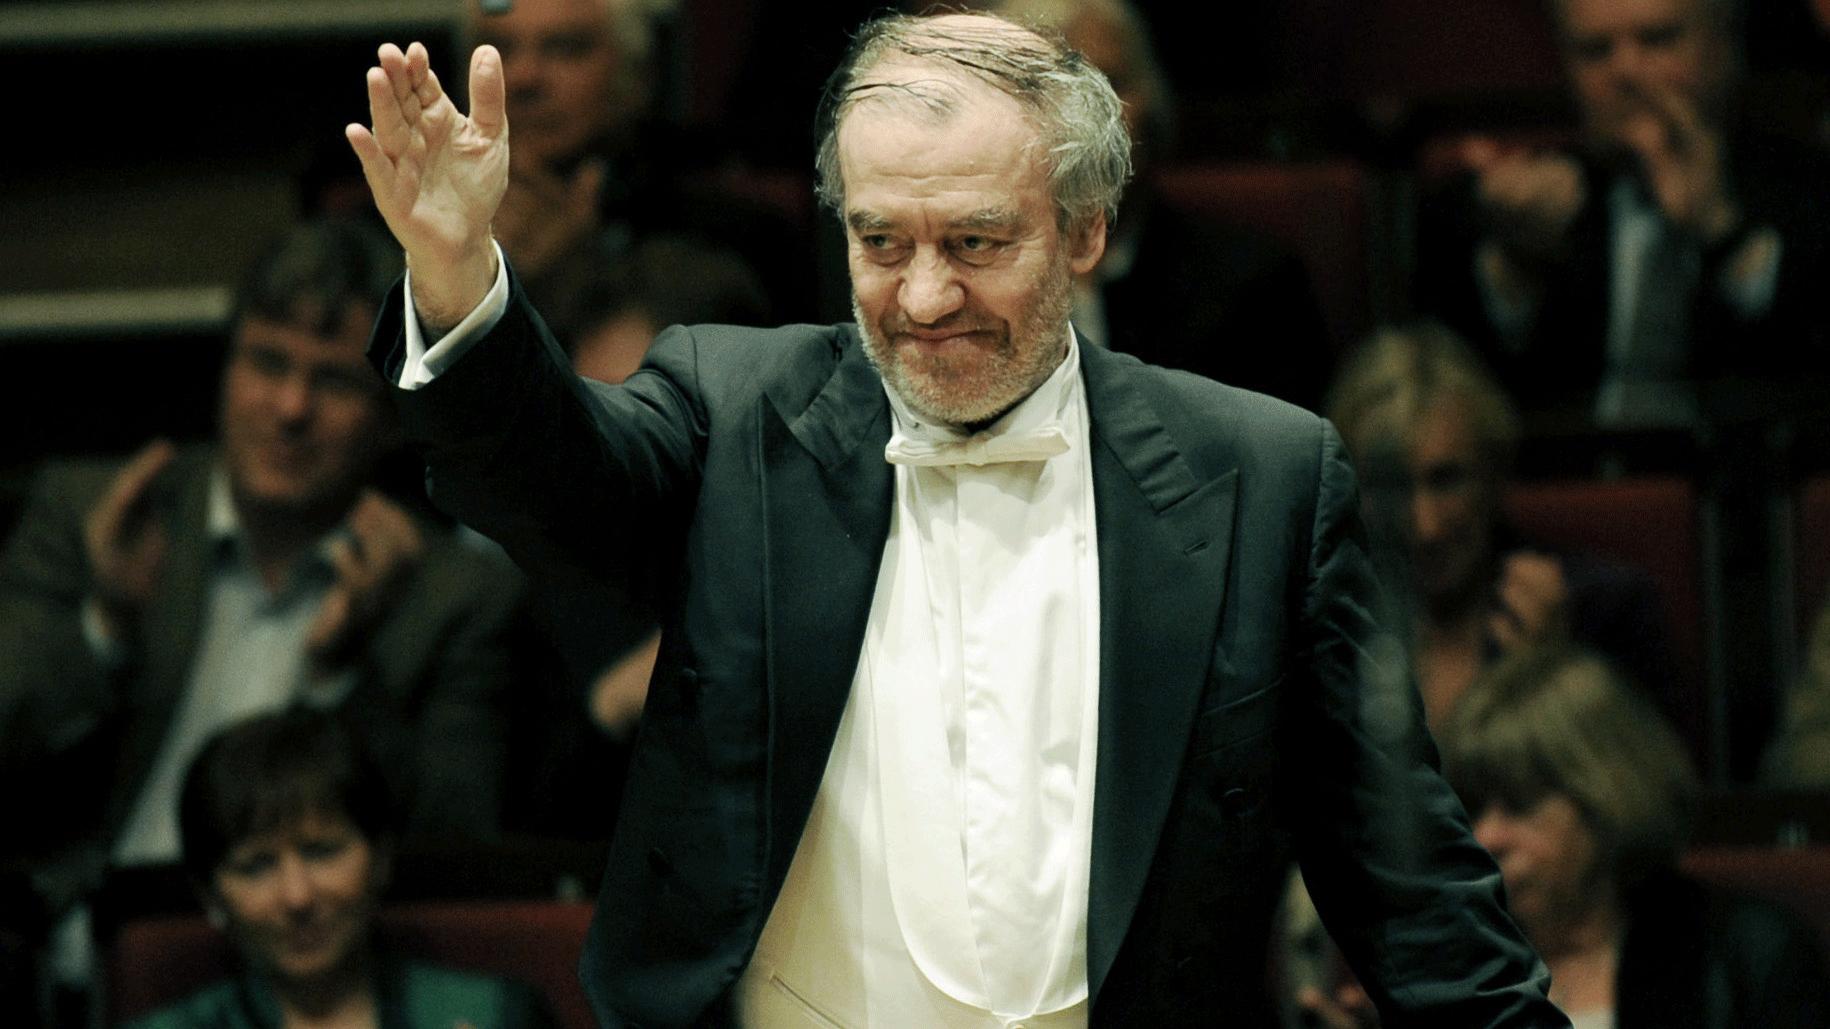 Valery Gergiev conducts Strauss and Berlioz – With Yulia Matochkina, Yekaterina Krapivina, Sergei Semishkur, Evgeny Akhmedov, and Yuri Vorobiev